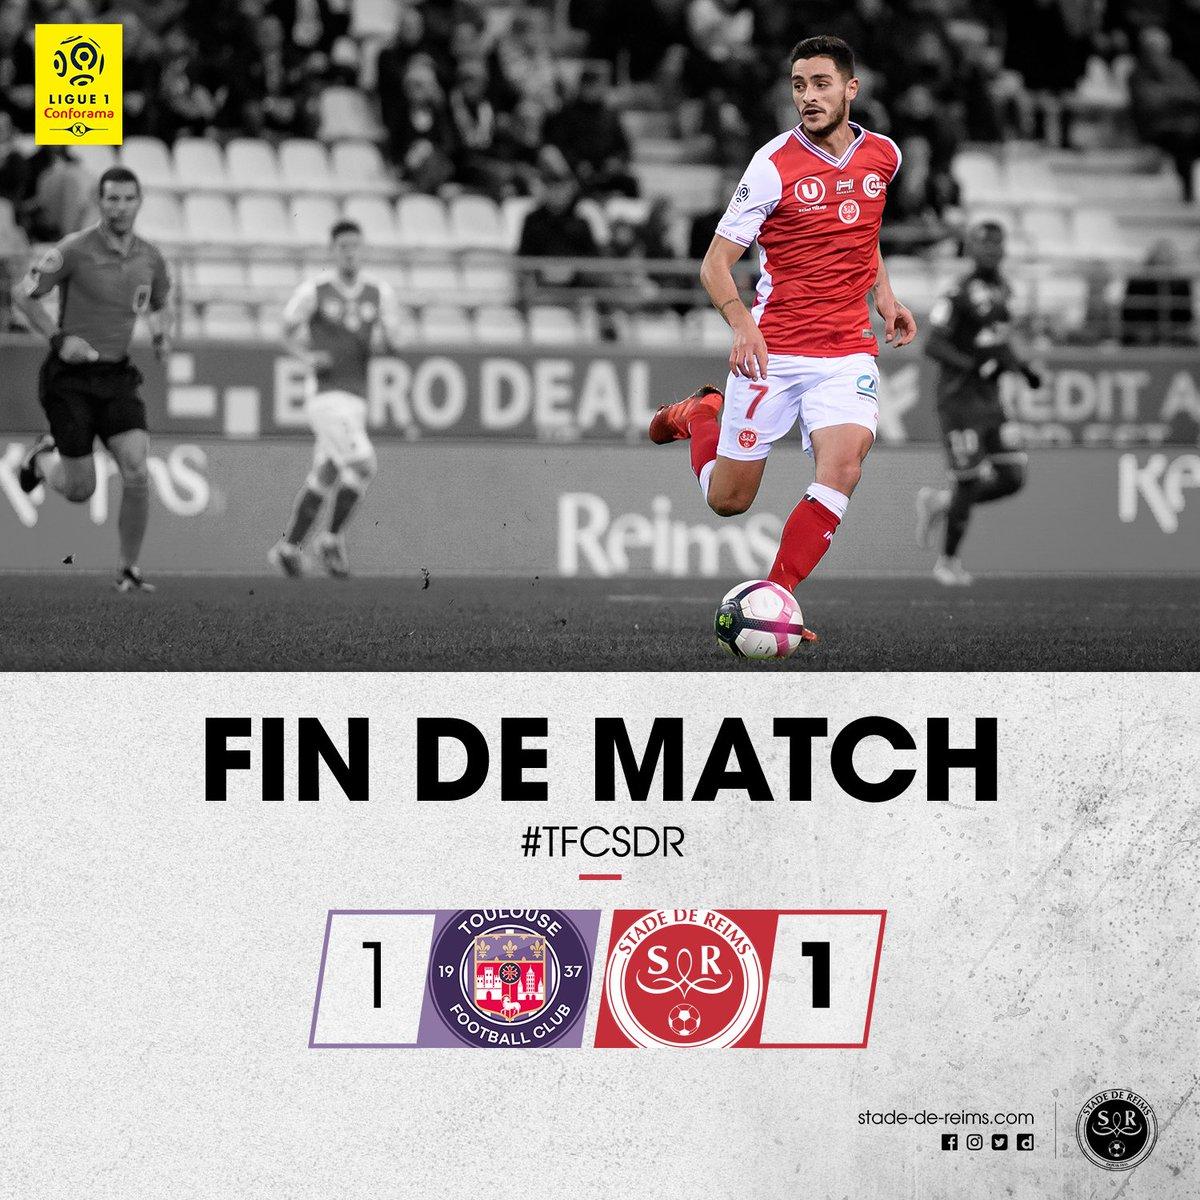 Stade de Reims's photo on #TFCSDR